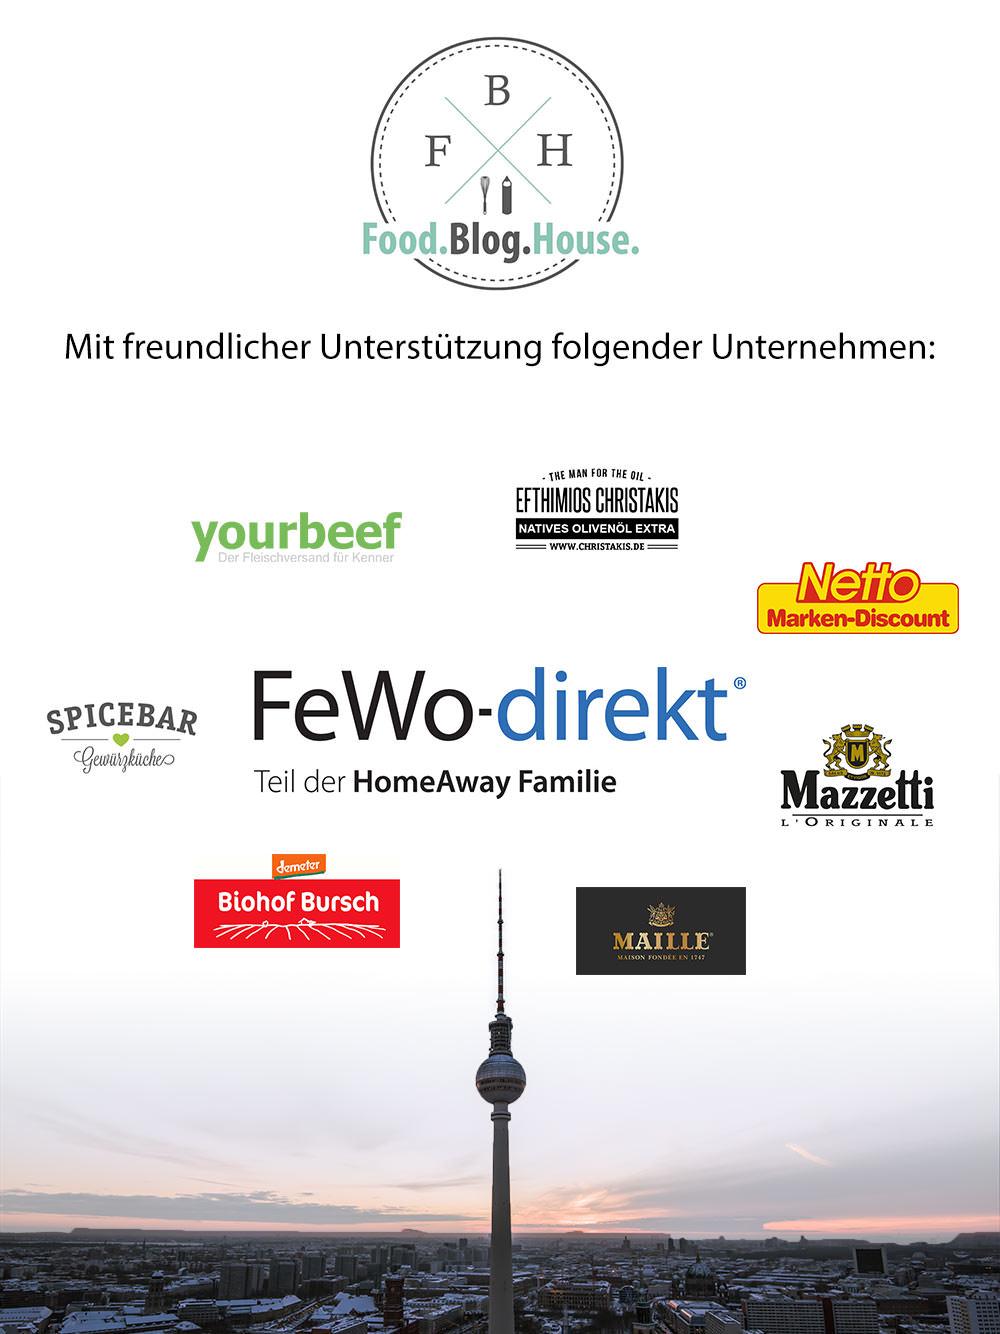 Food.Blog.House Sponsoren fewo-direkt yourbeef maille mazzetti netto marken-discount biohof bursch spicebar